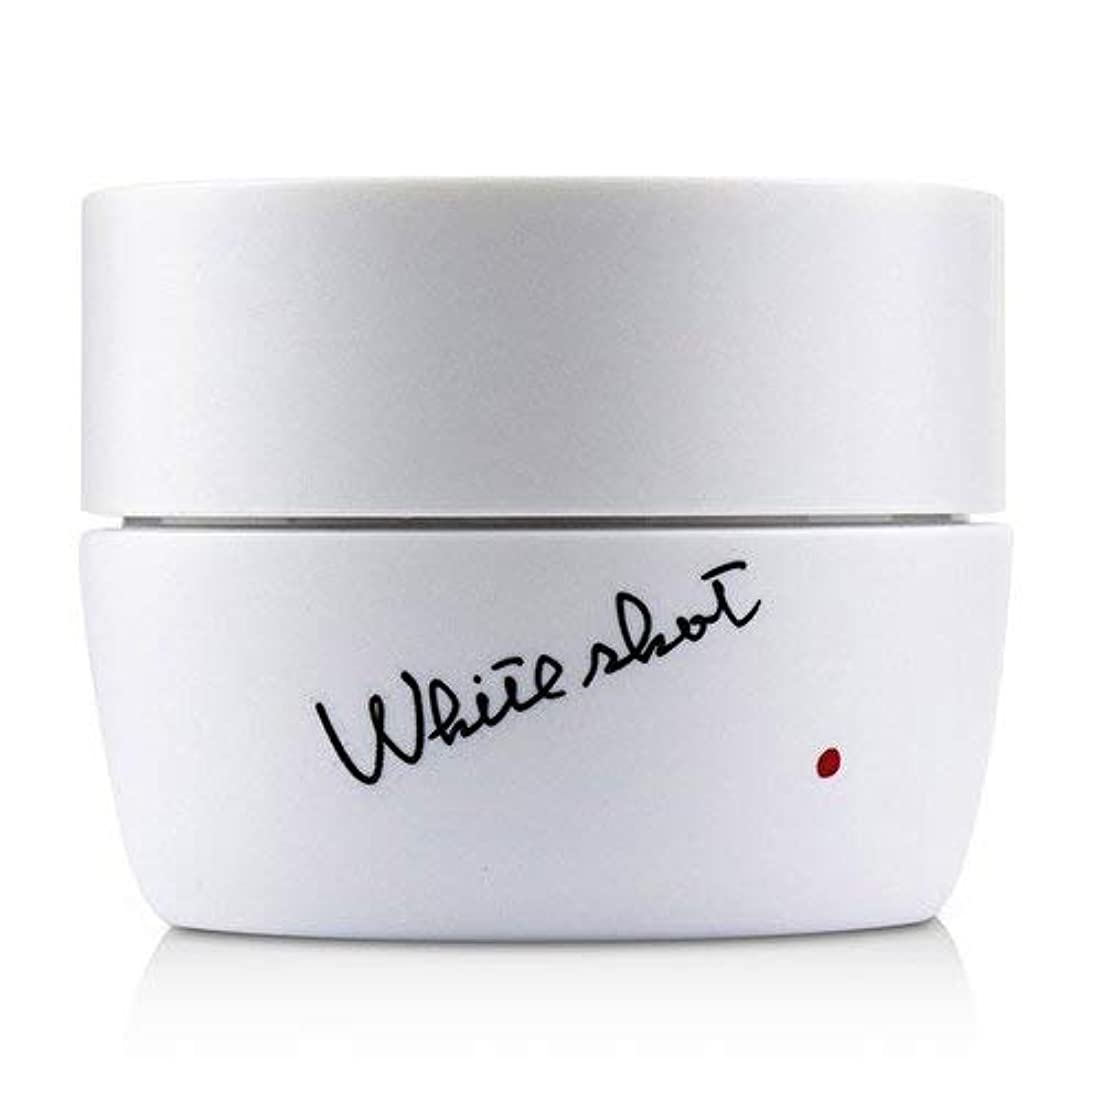 pola ホワイトショットRXS 新商品